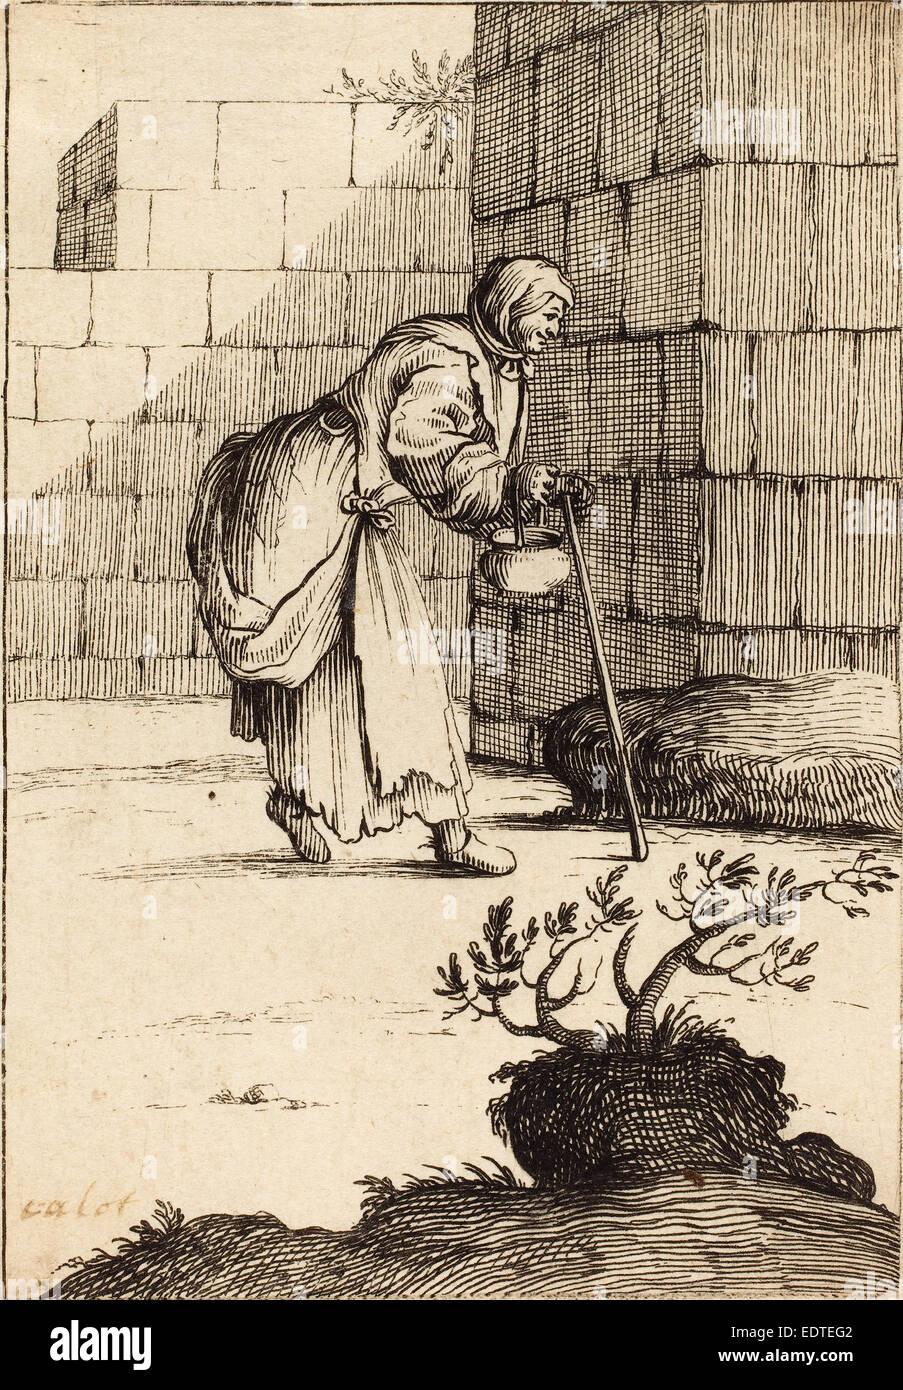 17 Jahrhundert Bild Architektur: Nach Jacques Callot Radierung Bettler Frau, 17